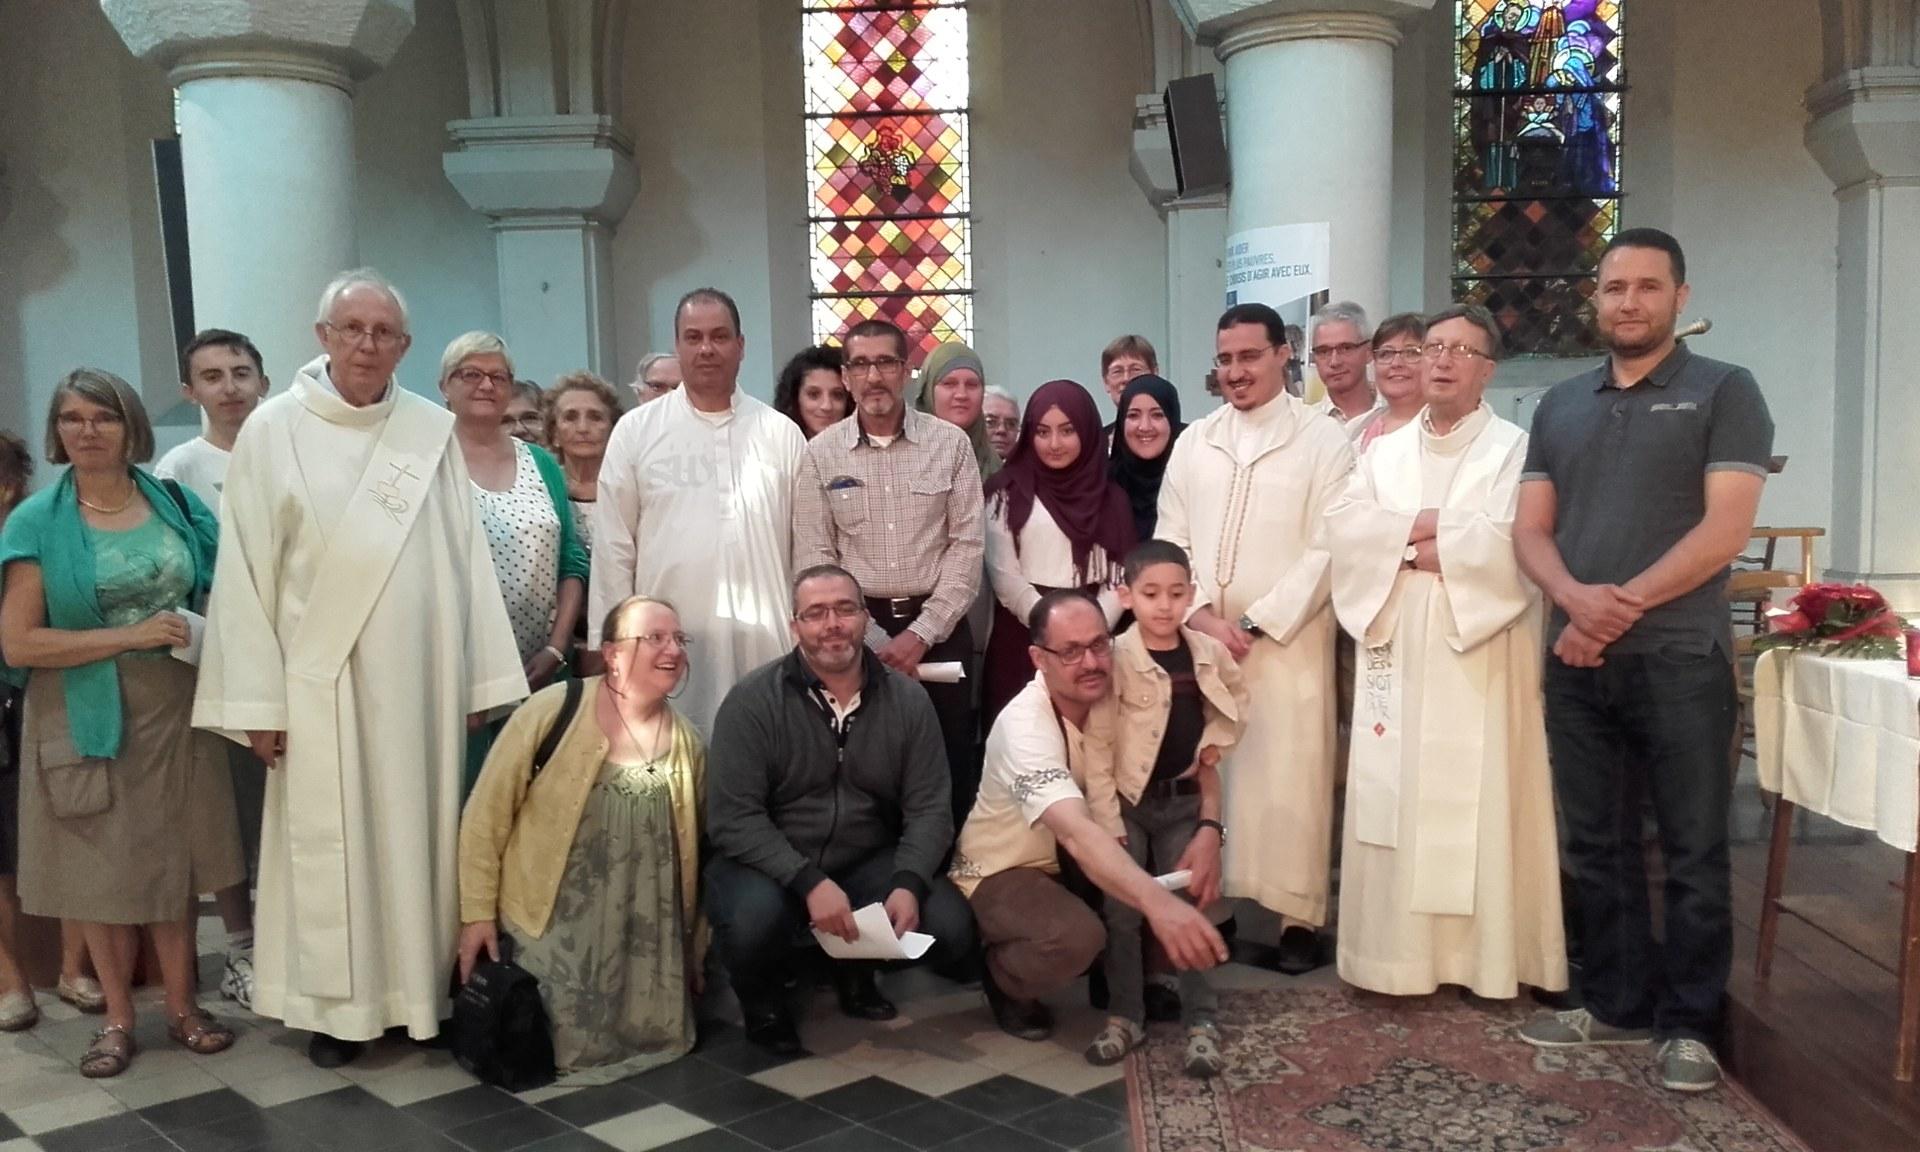 soirée inter-religieuse 29 juillet 2016